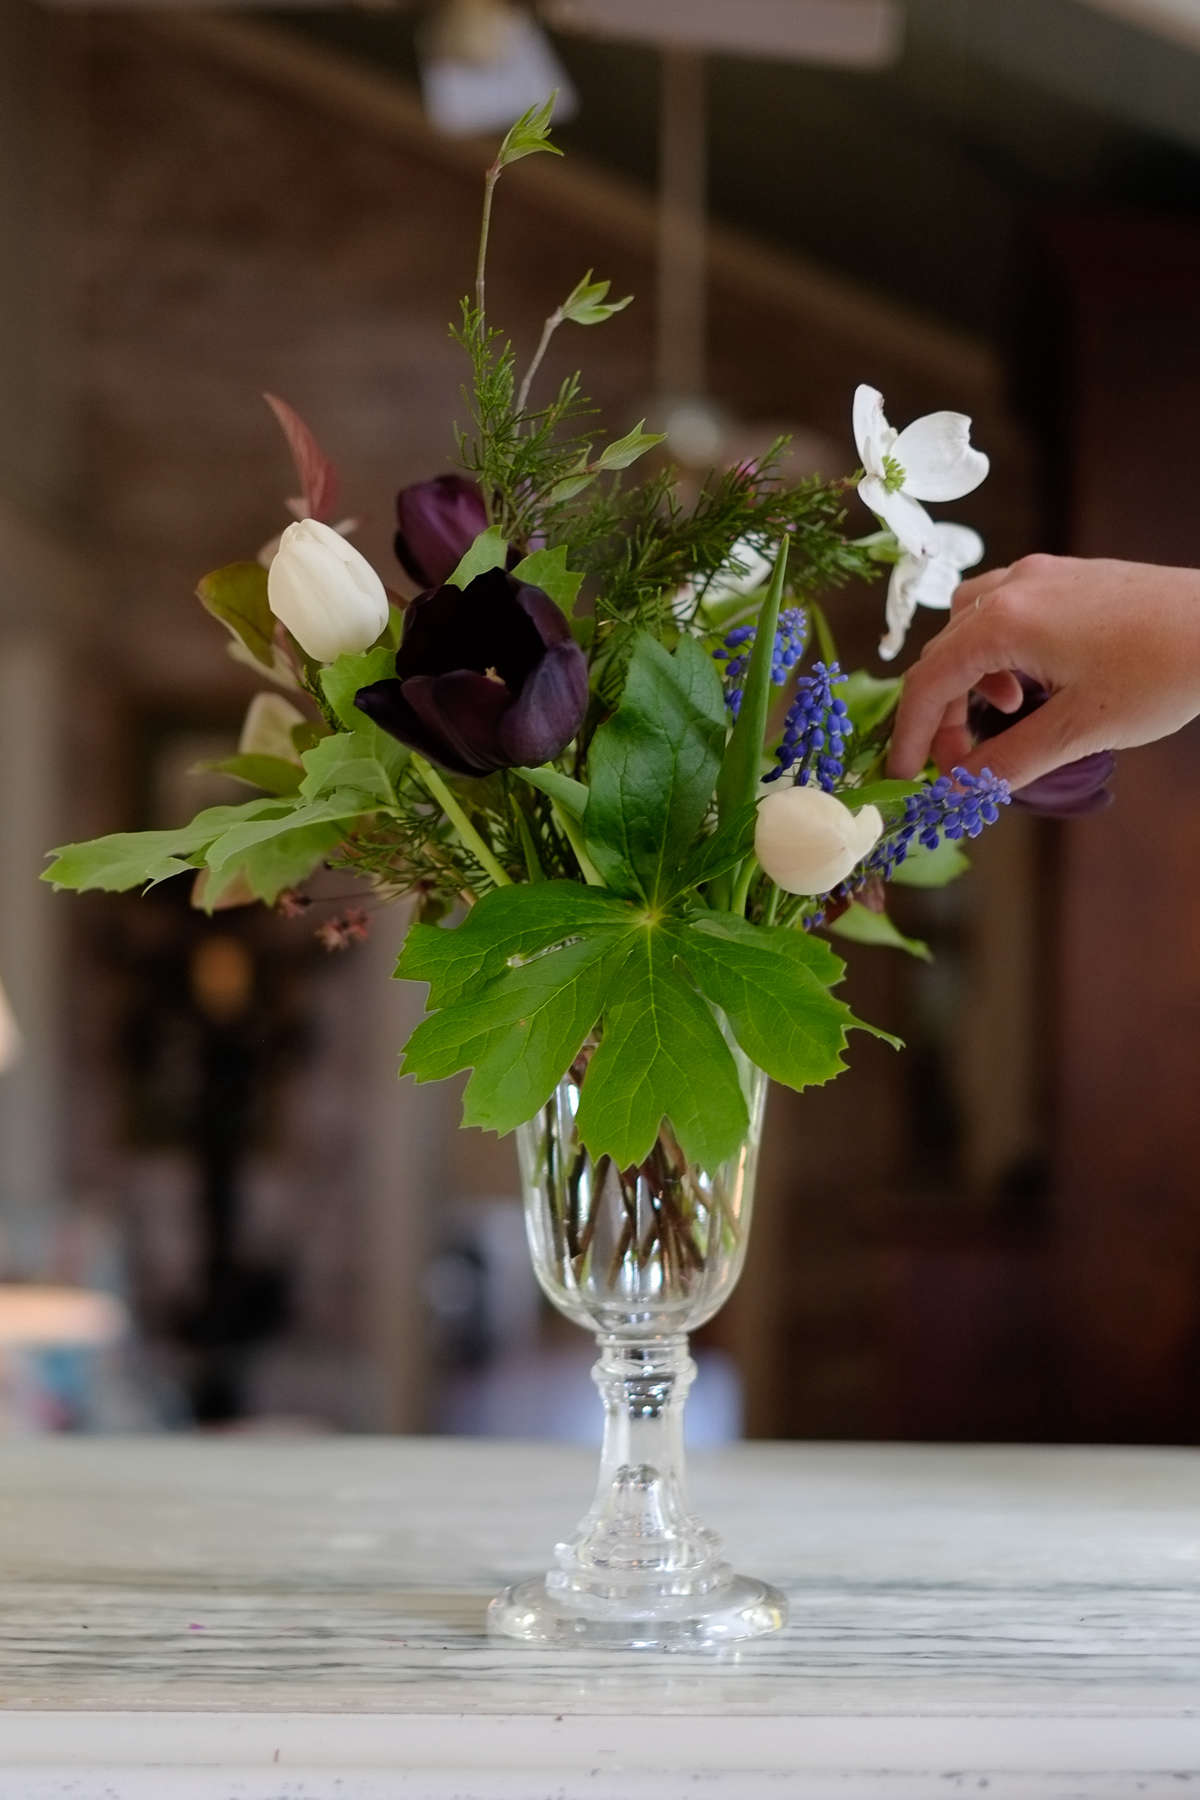 Tara-Douglas-wedding#11-hand-gardenista-SPMP-20140501-025